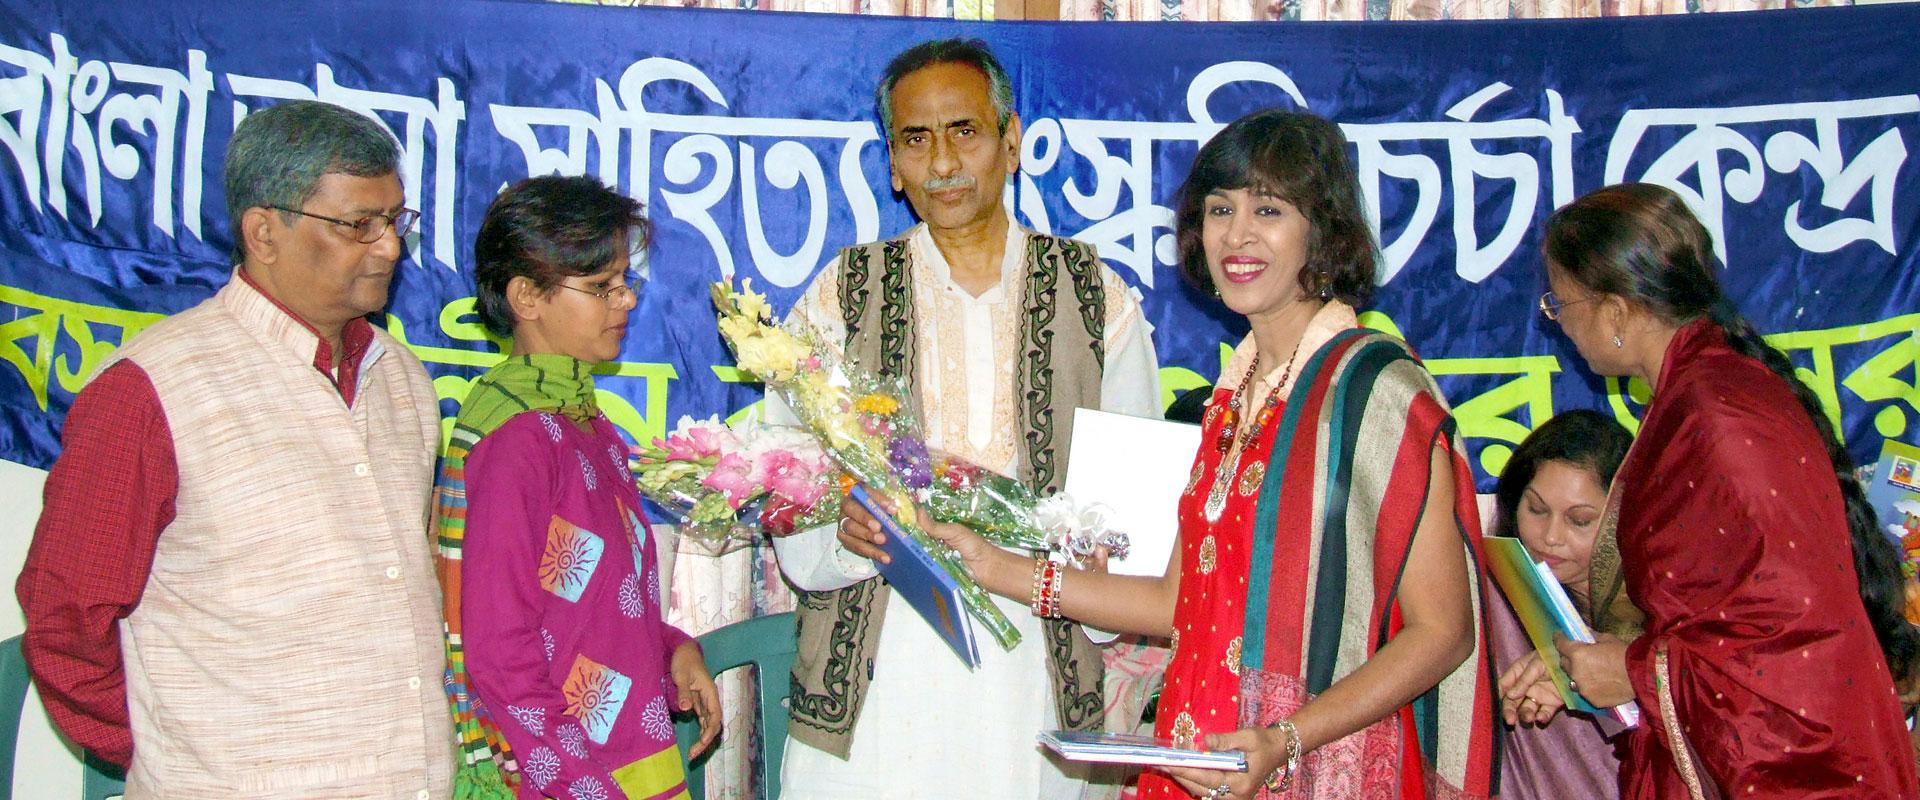 Opar-Bangla